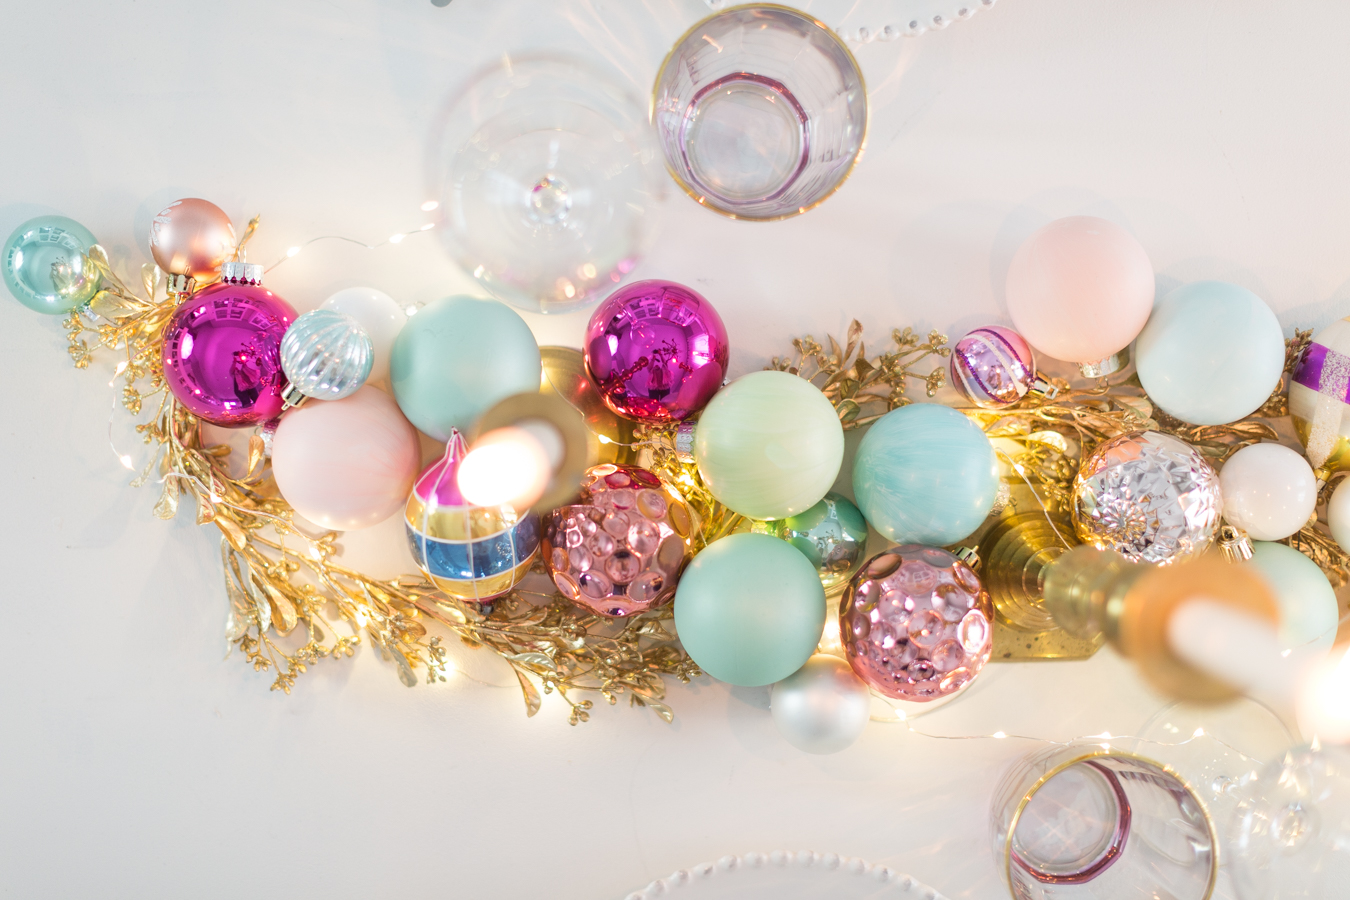 festivechristmastablecraftberrybush-11